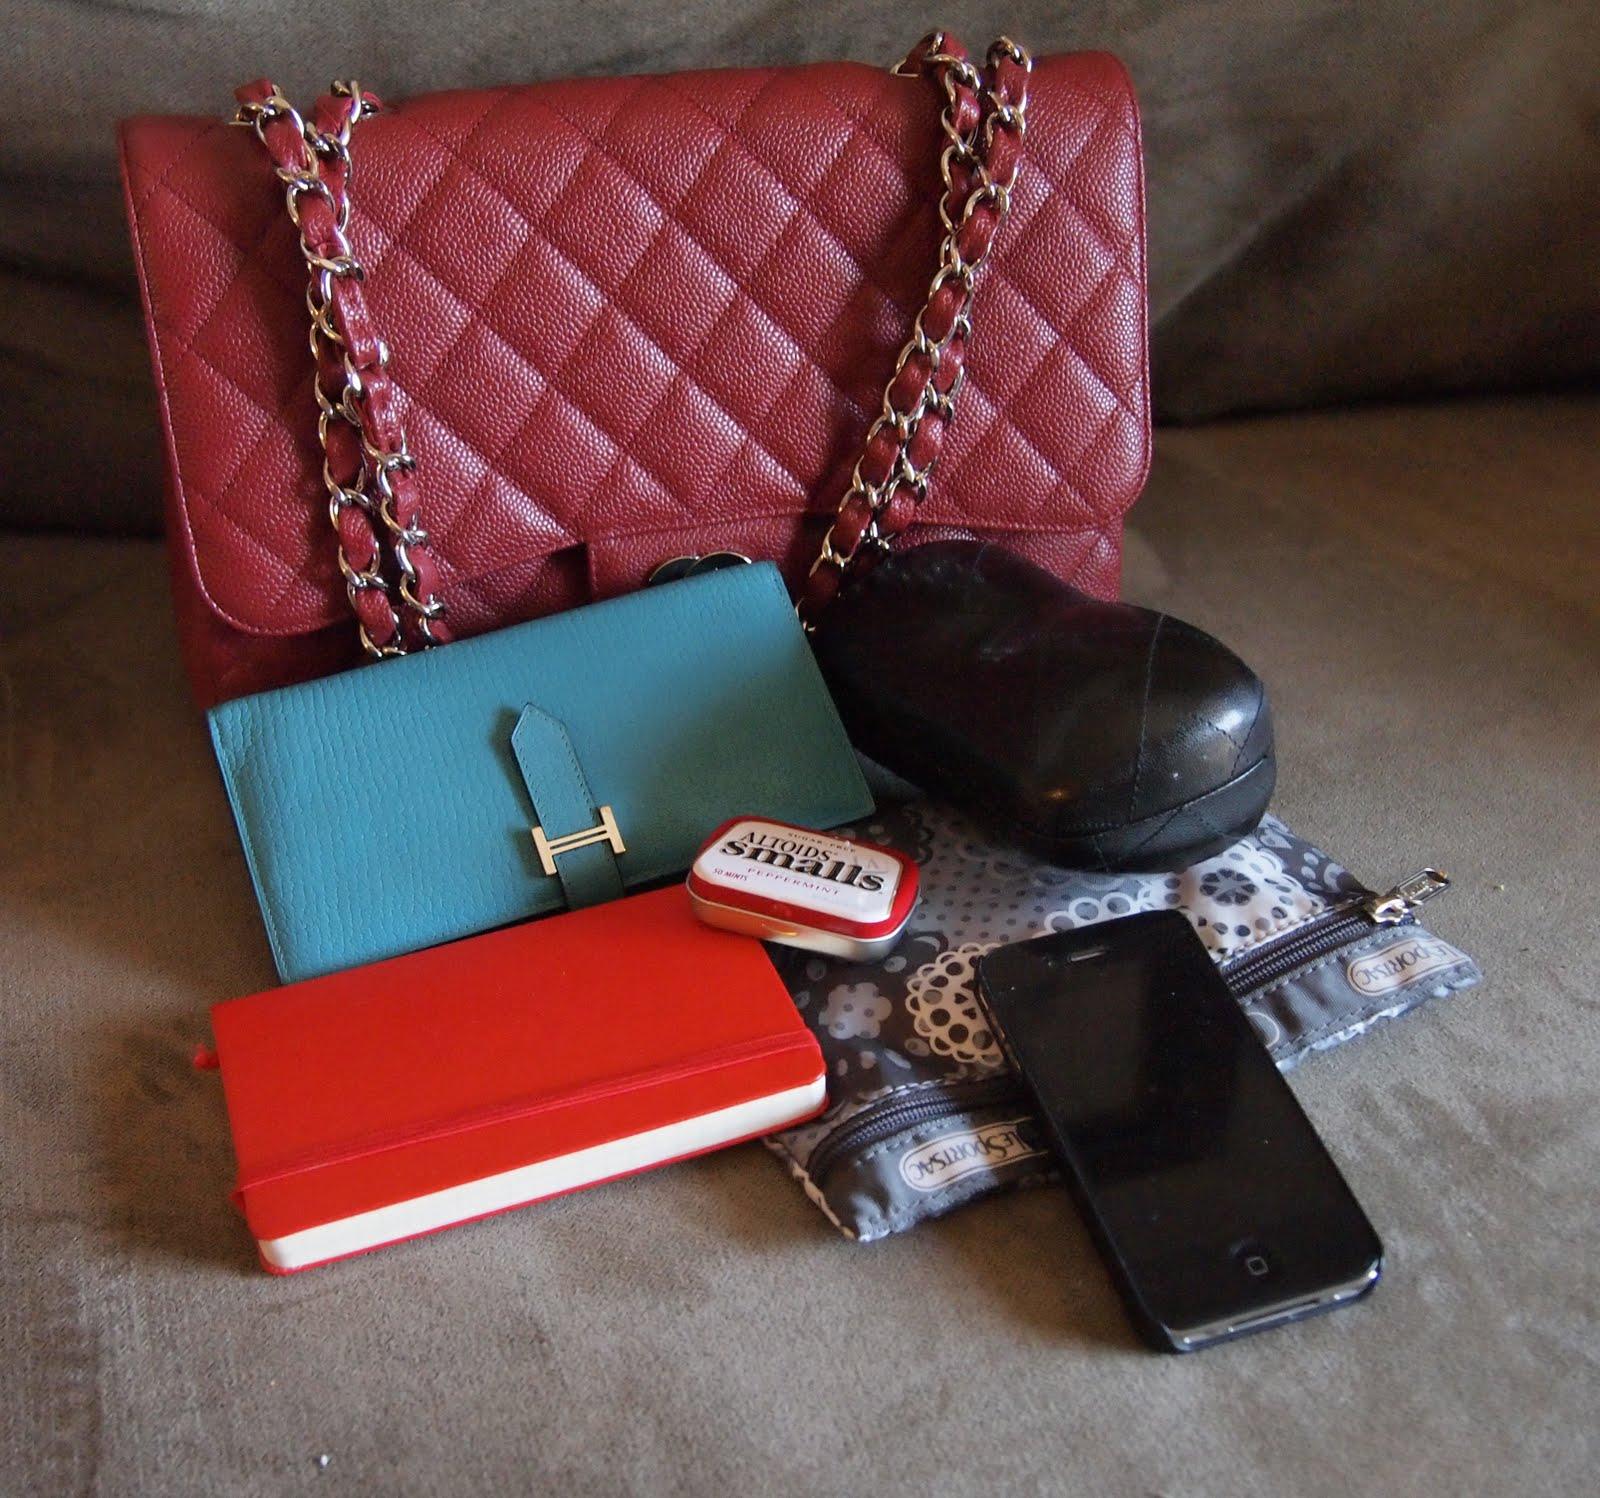 hermes birkin replica handbags - Bag comparison: Hermes Birkin 30cm and 35cm vs. Chanel Jumbo ...